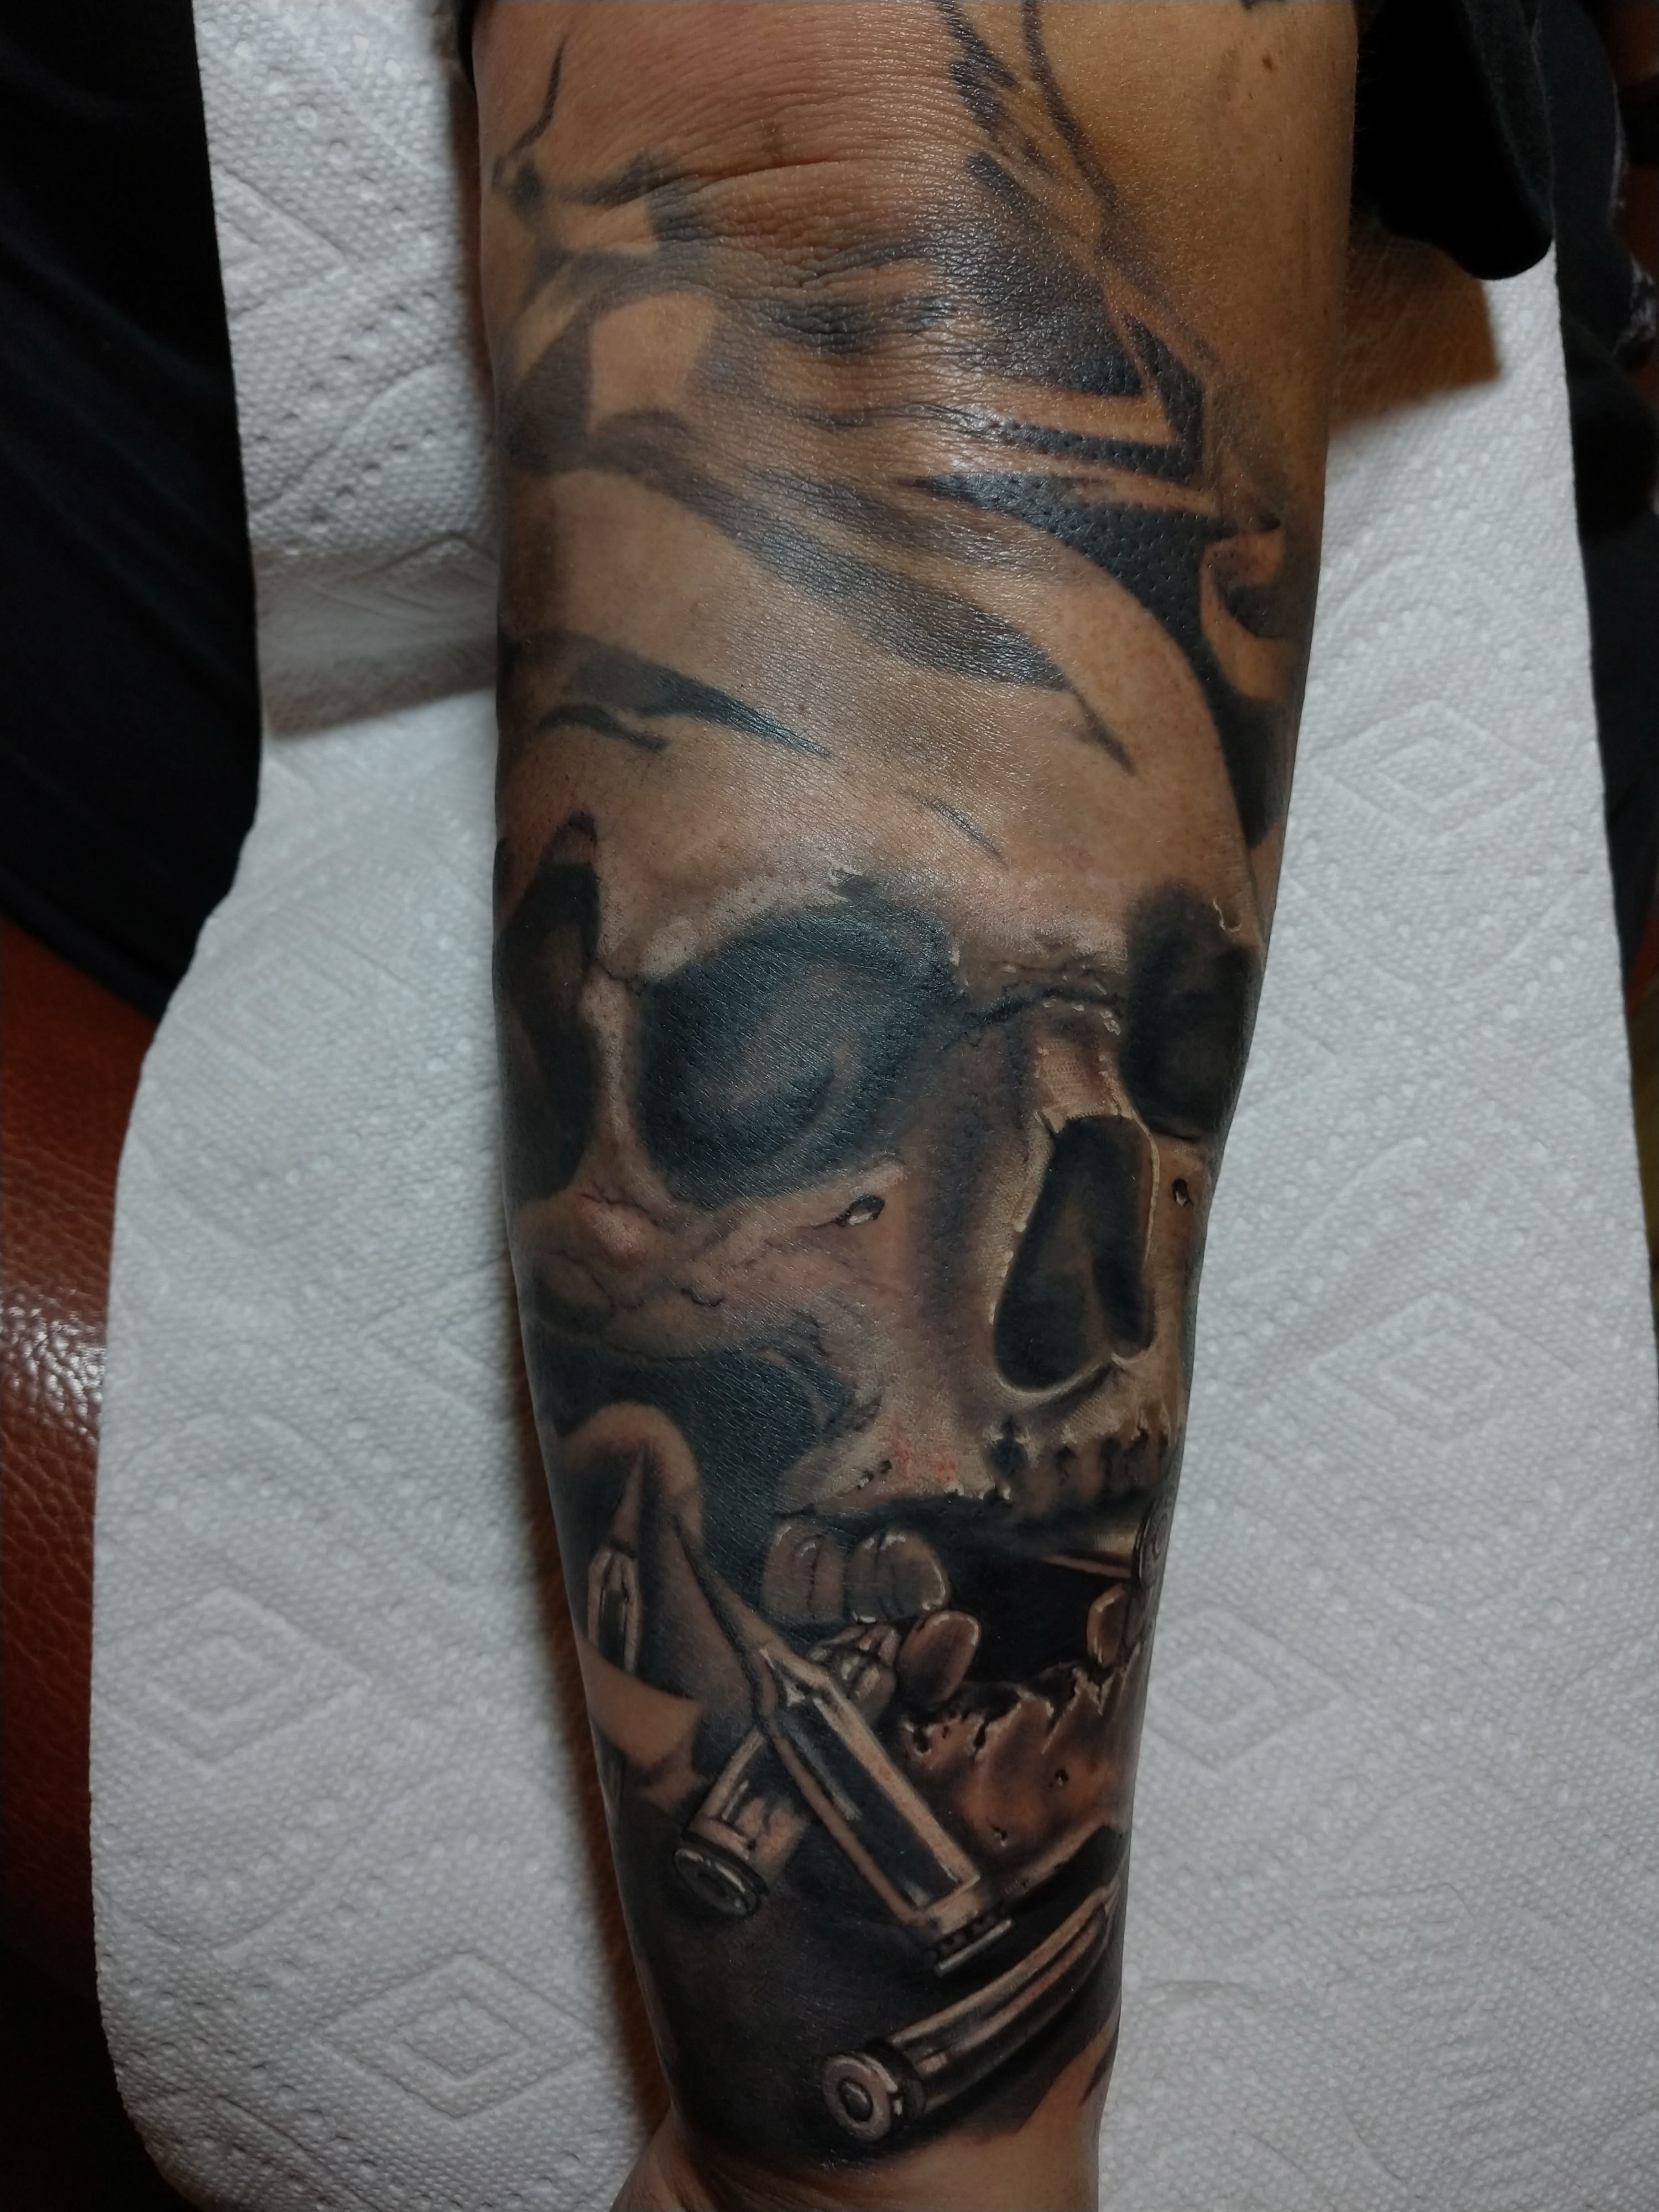 Long Tattoo Session